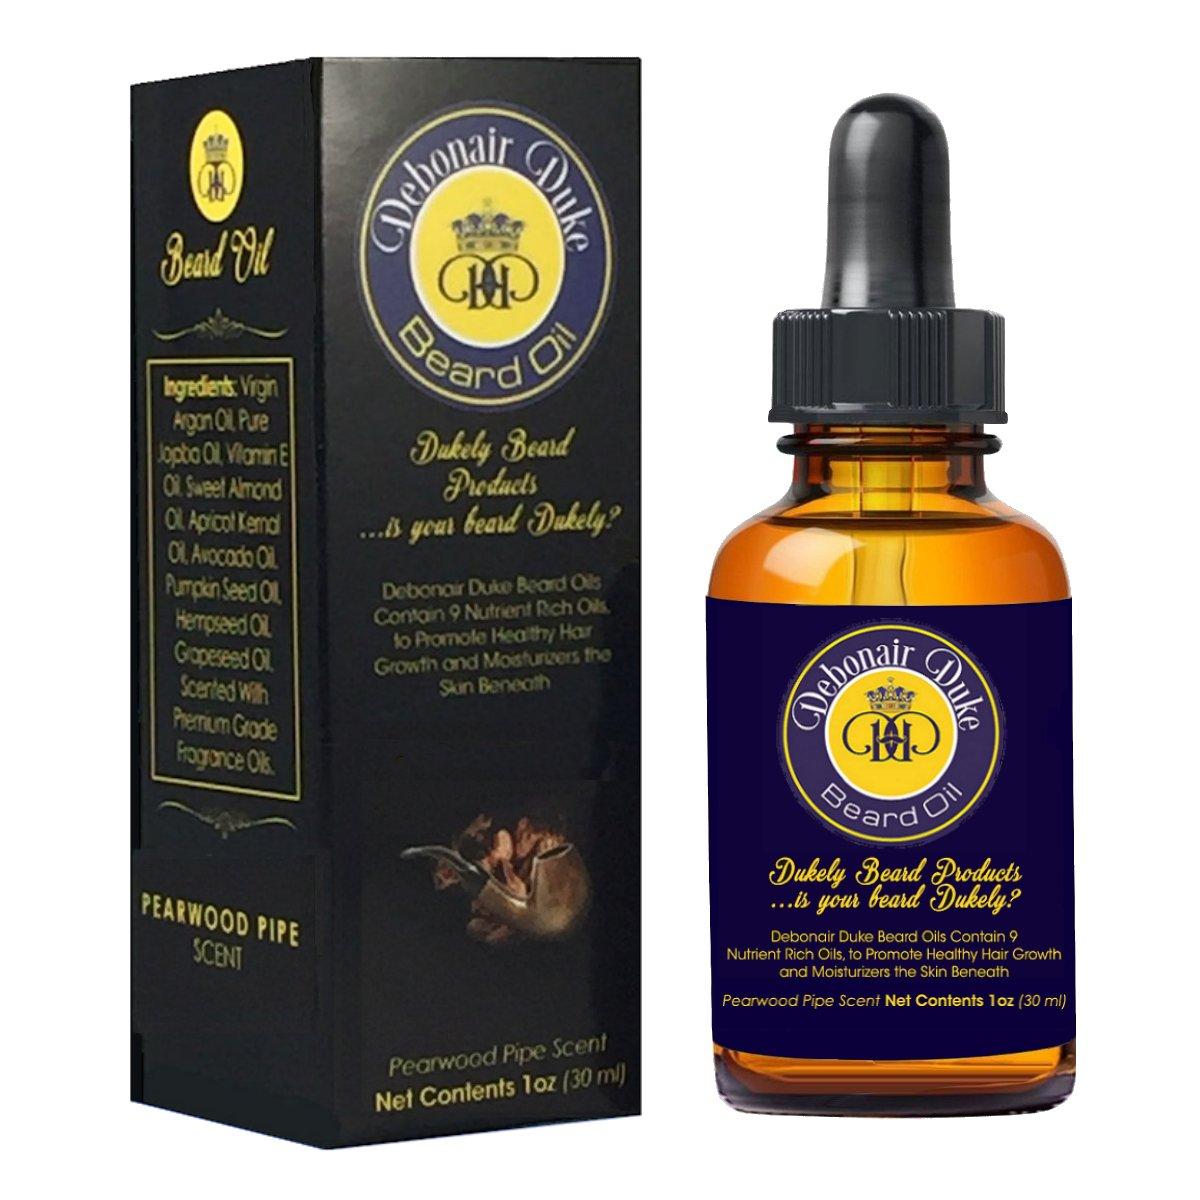 Debonair Duke Pearwood Pipe Scent-Best Men's 100% Natural Beard Oil/Leave-In Conditioner & Softener-Stimulates Beard Growth-Moisturizes Skin-Great for All Men's Beard Styles & Grooming-Made In USA Dukely Beard Co